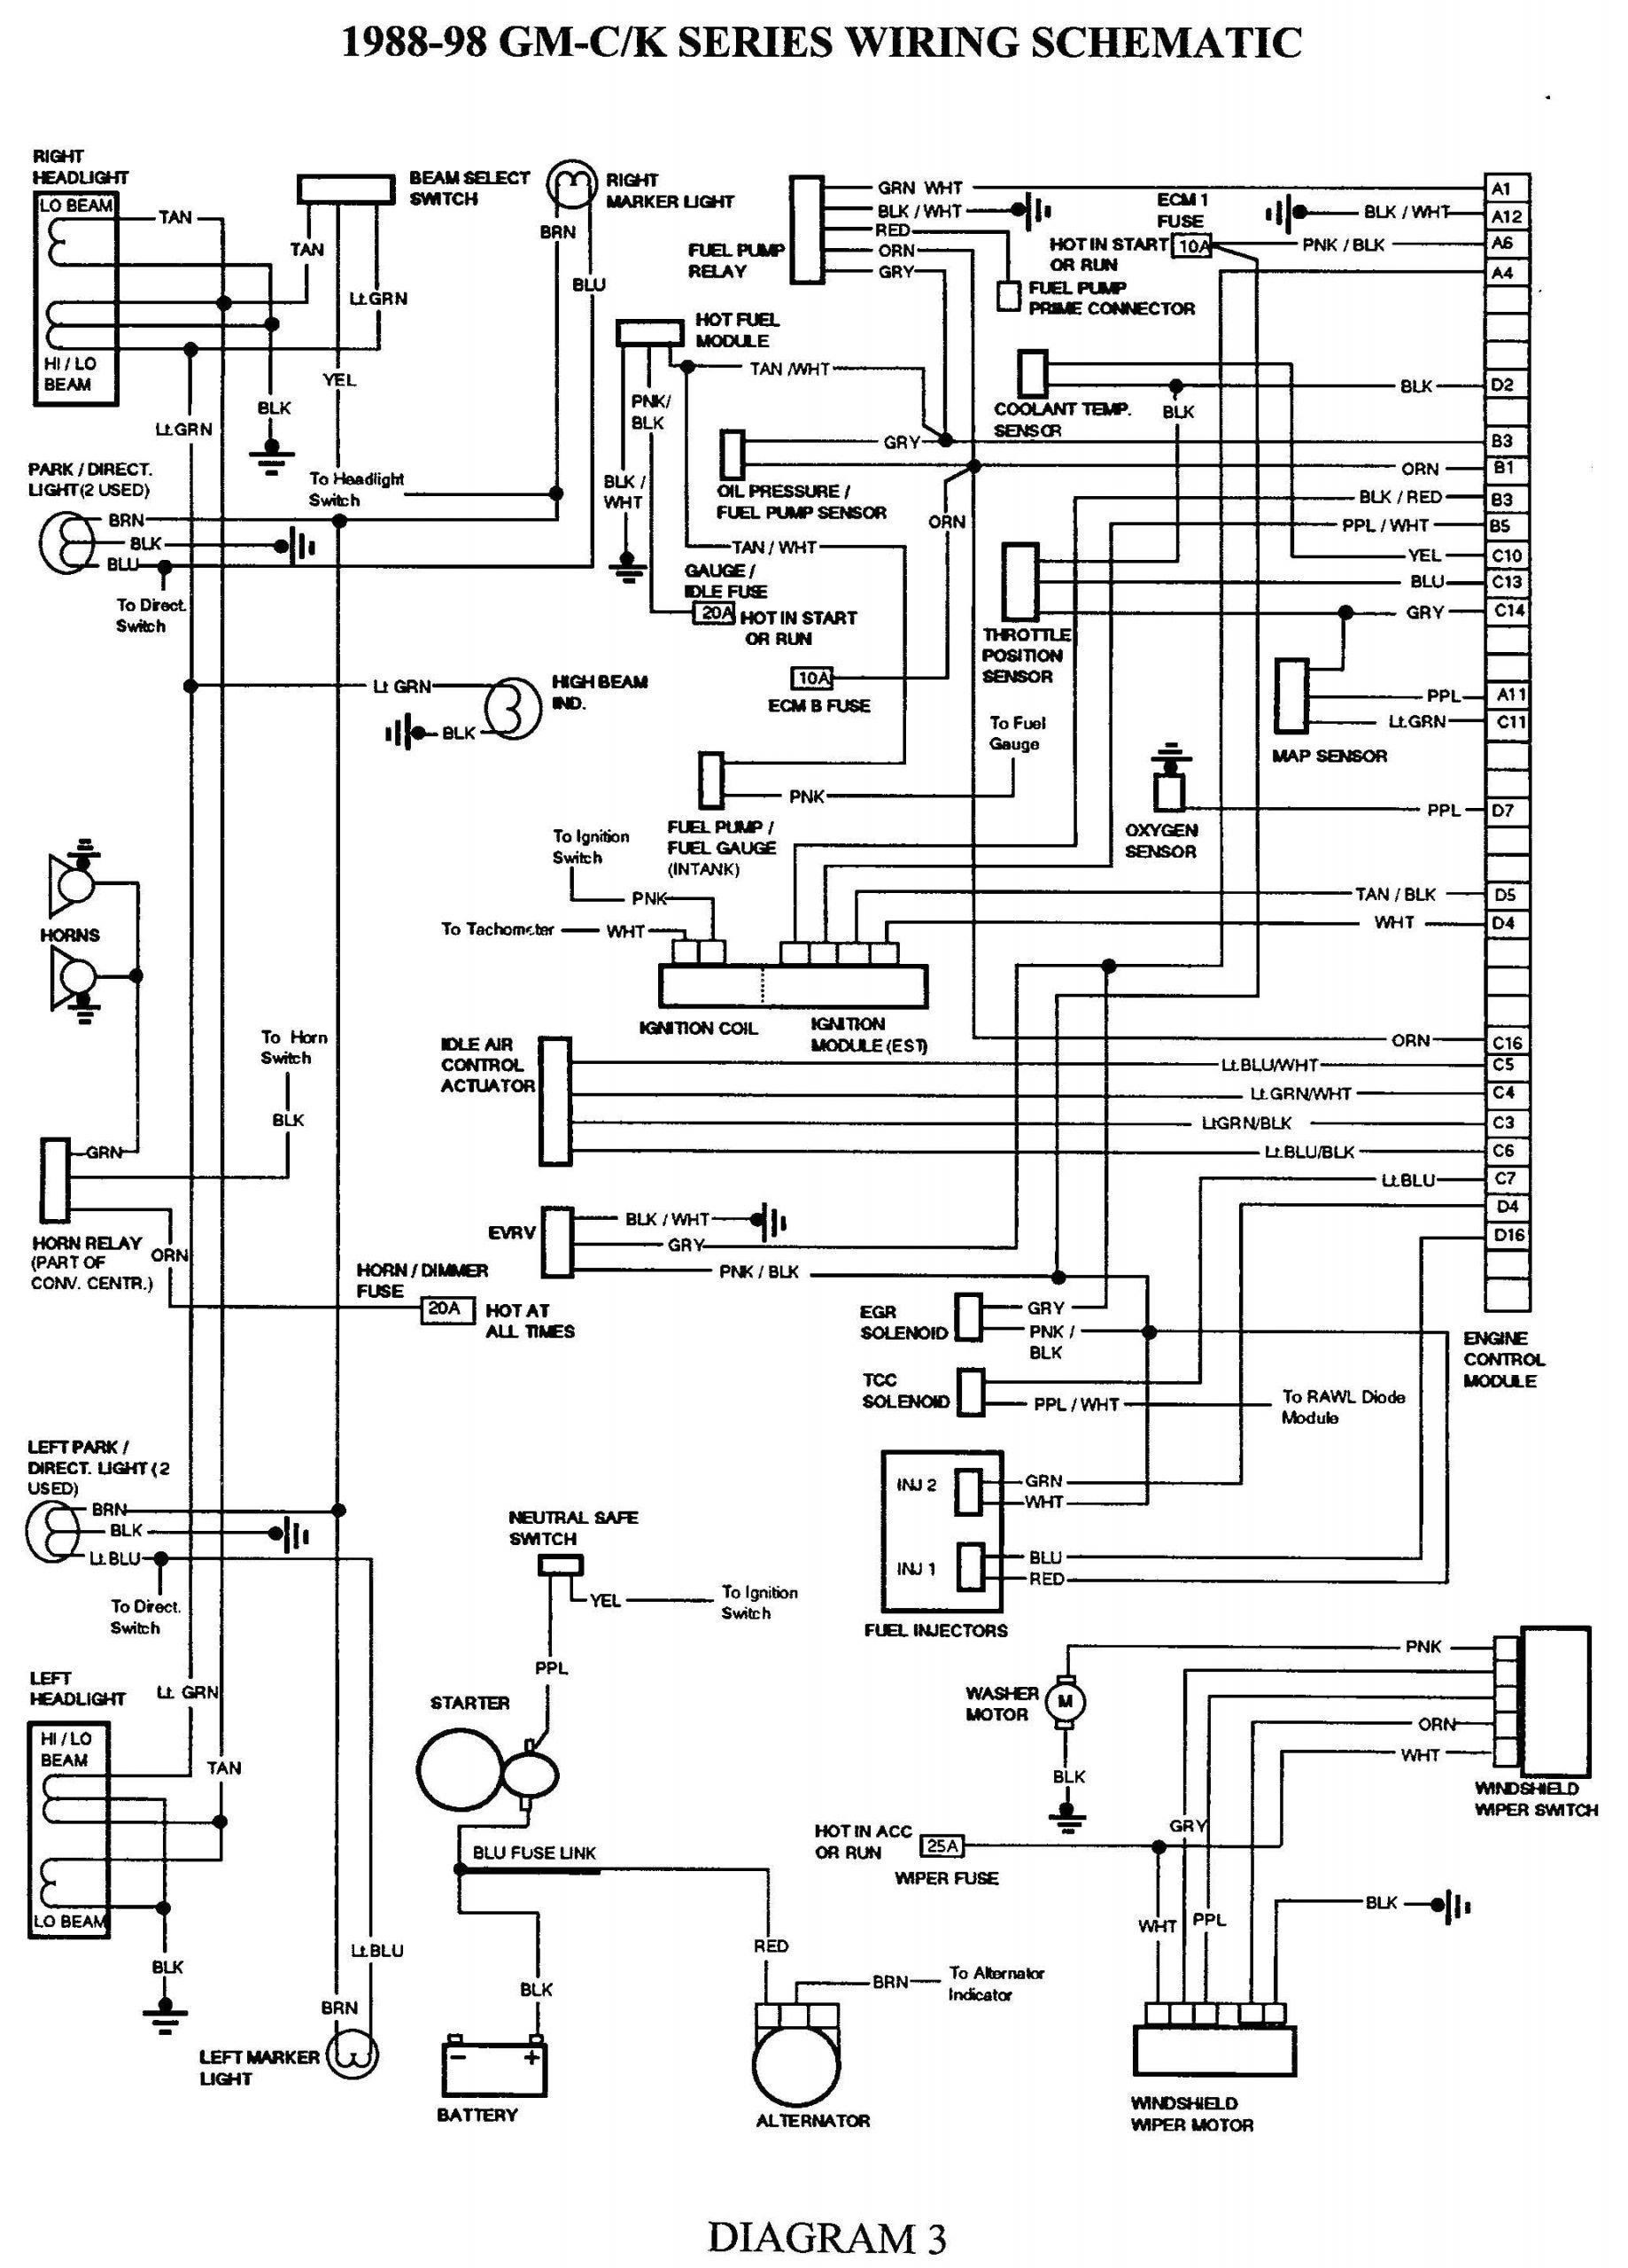 1988 Chevy Truck Fuel Pump Wiring Diagram 97 Chevy Z71 Wiring Diagram Wiring Diagram Data